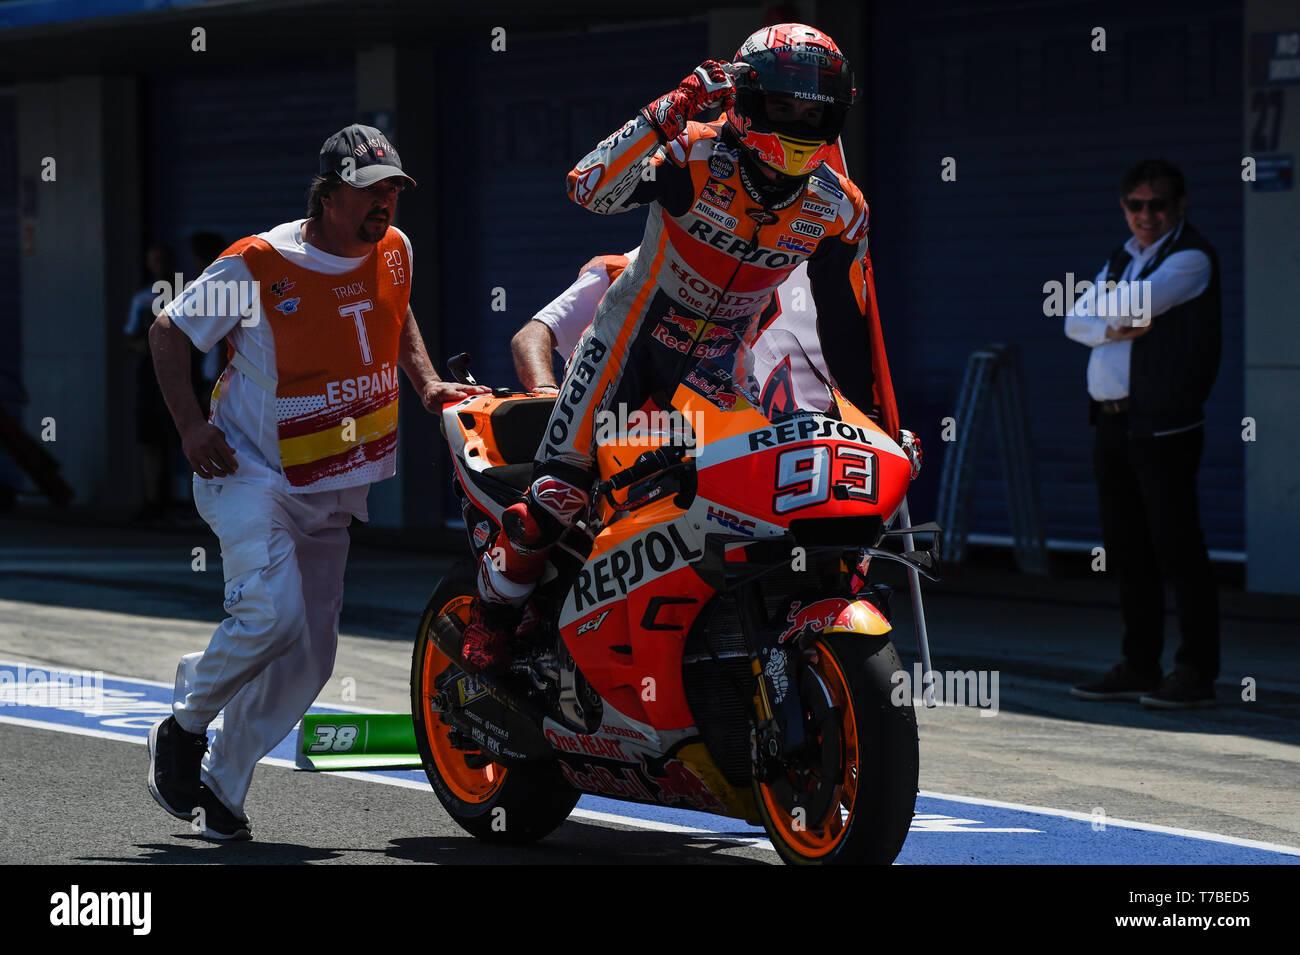 Marc Marquez Win In Honda Stock Photos & Marc Marquez Win In